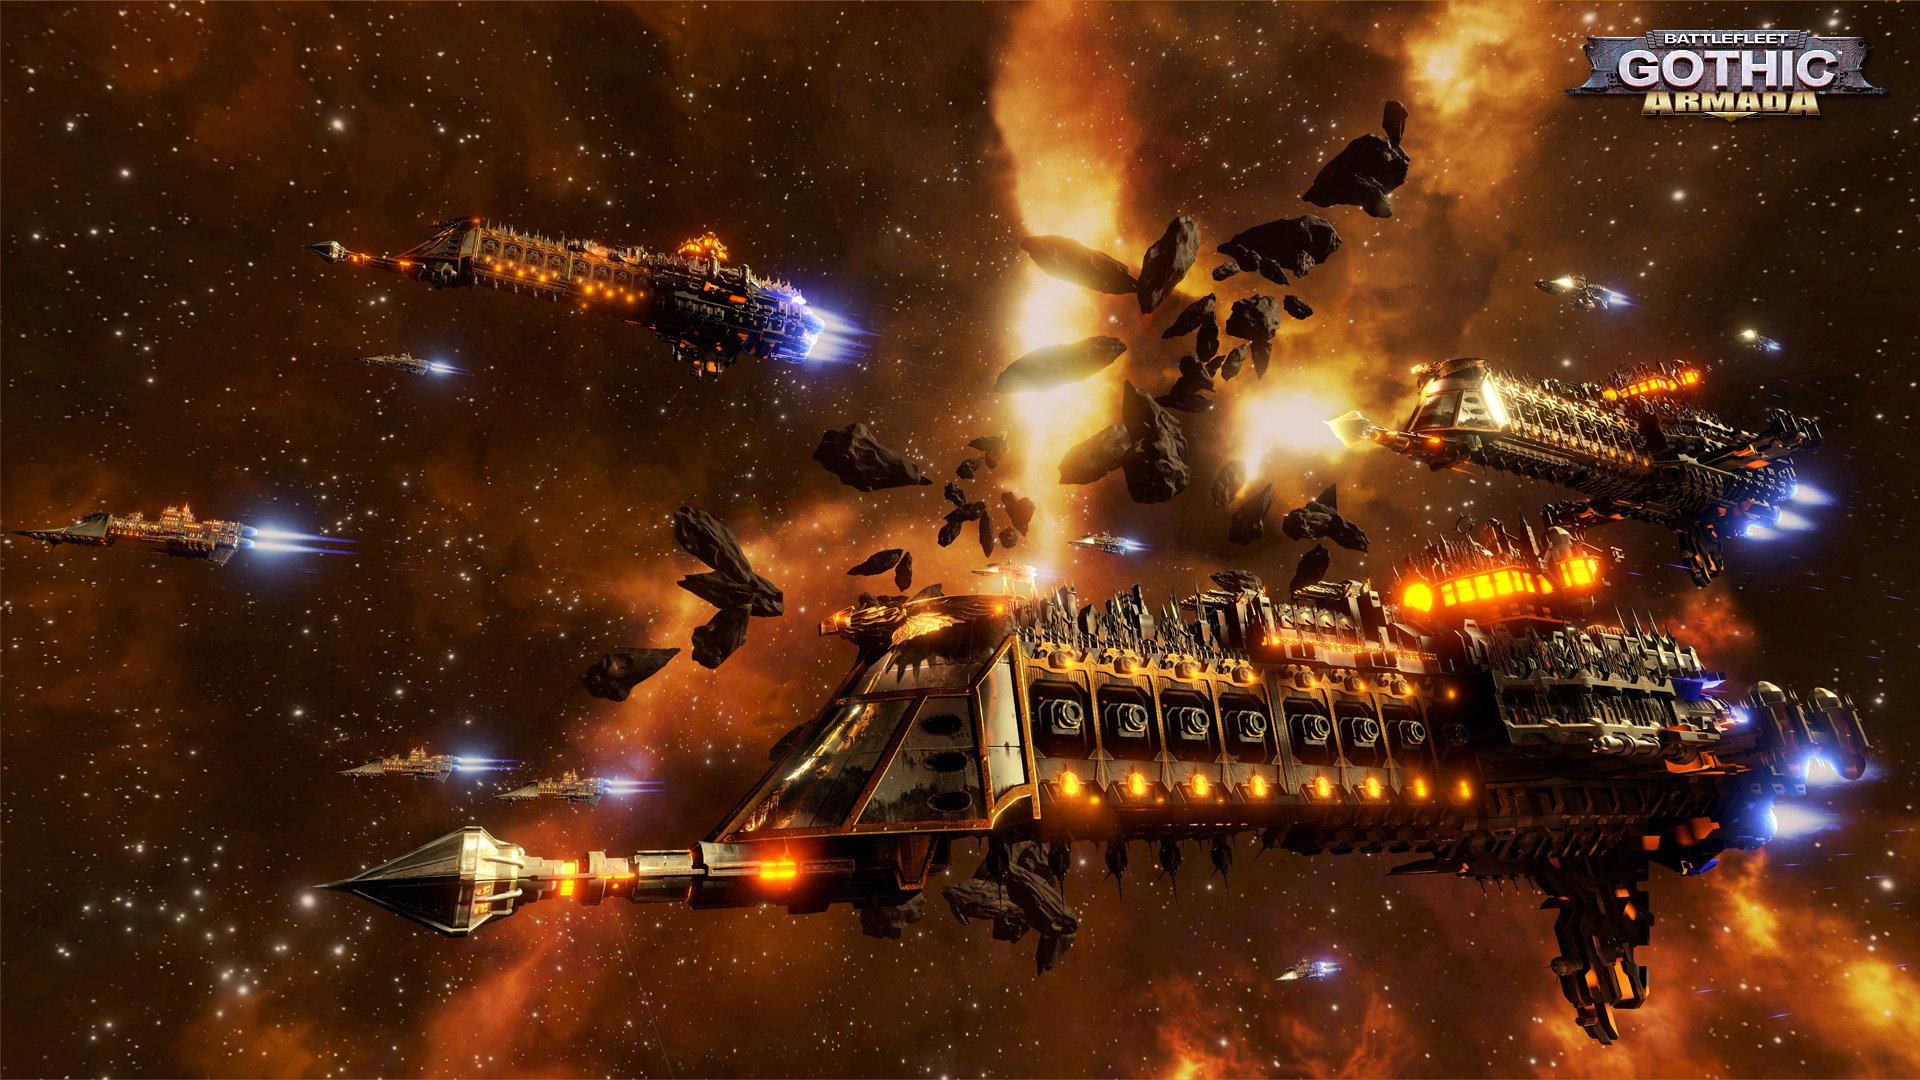 Battlefleet Gothic Armada Wallpapers 1920x1080 Full Hd 1080p